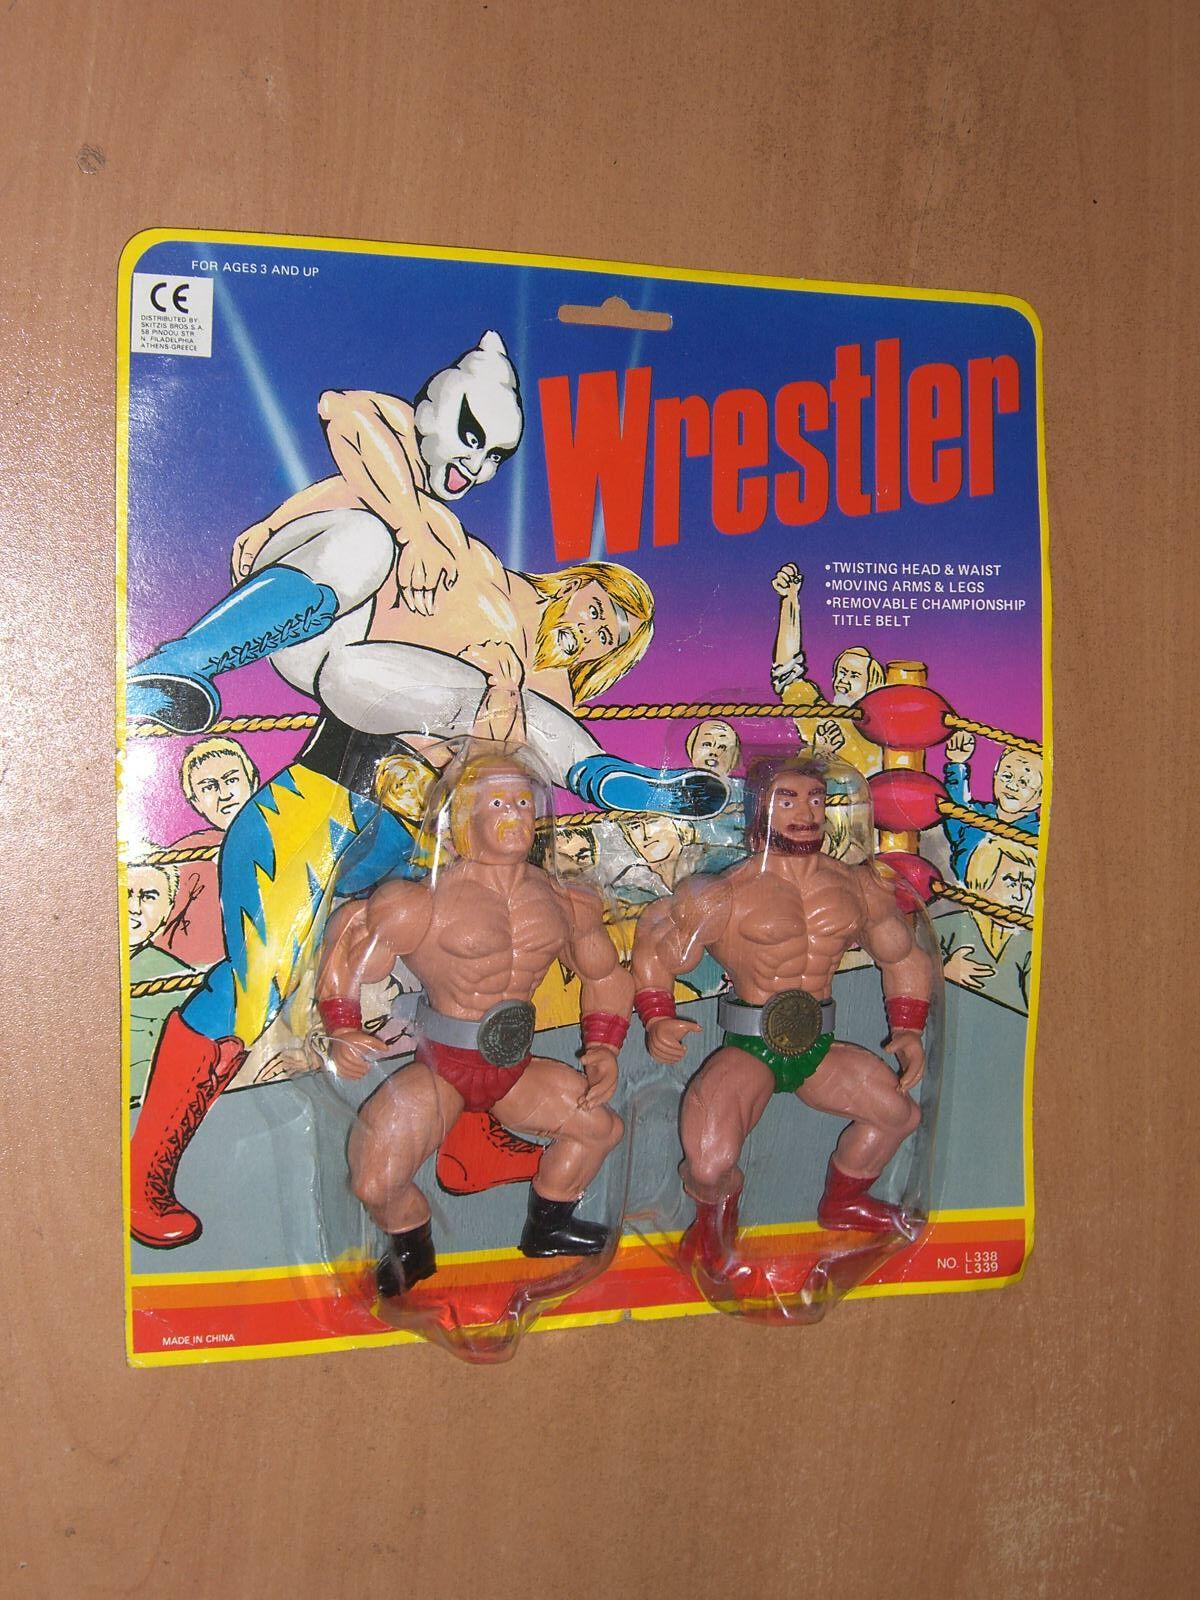 80'S VINTAGE WWF FIGURE WRESTLER CHAMPION MOC ULTRA RARE MOTU KO SGI 4